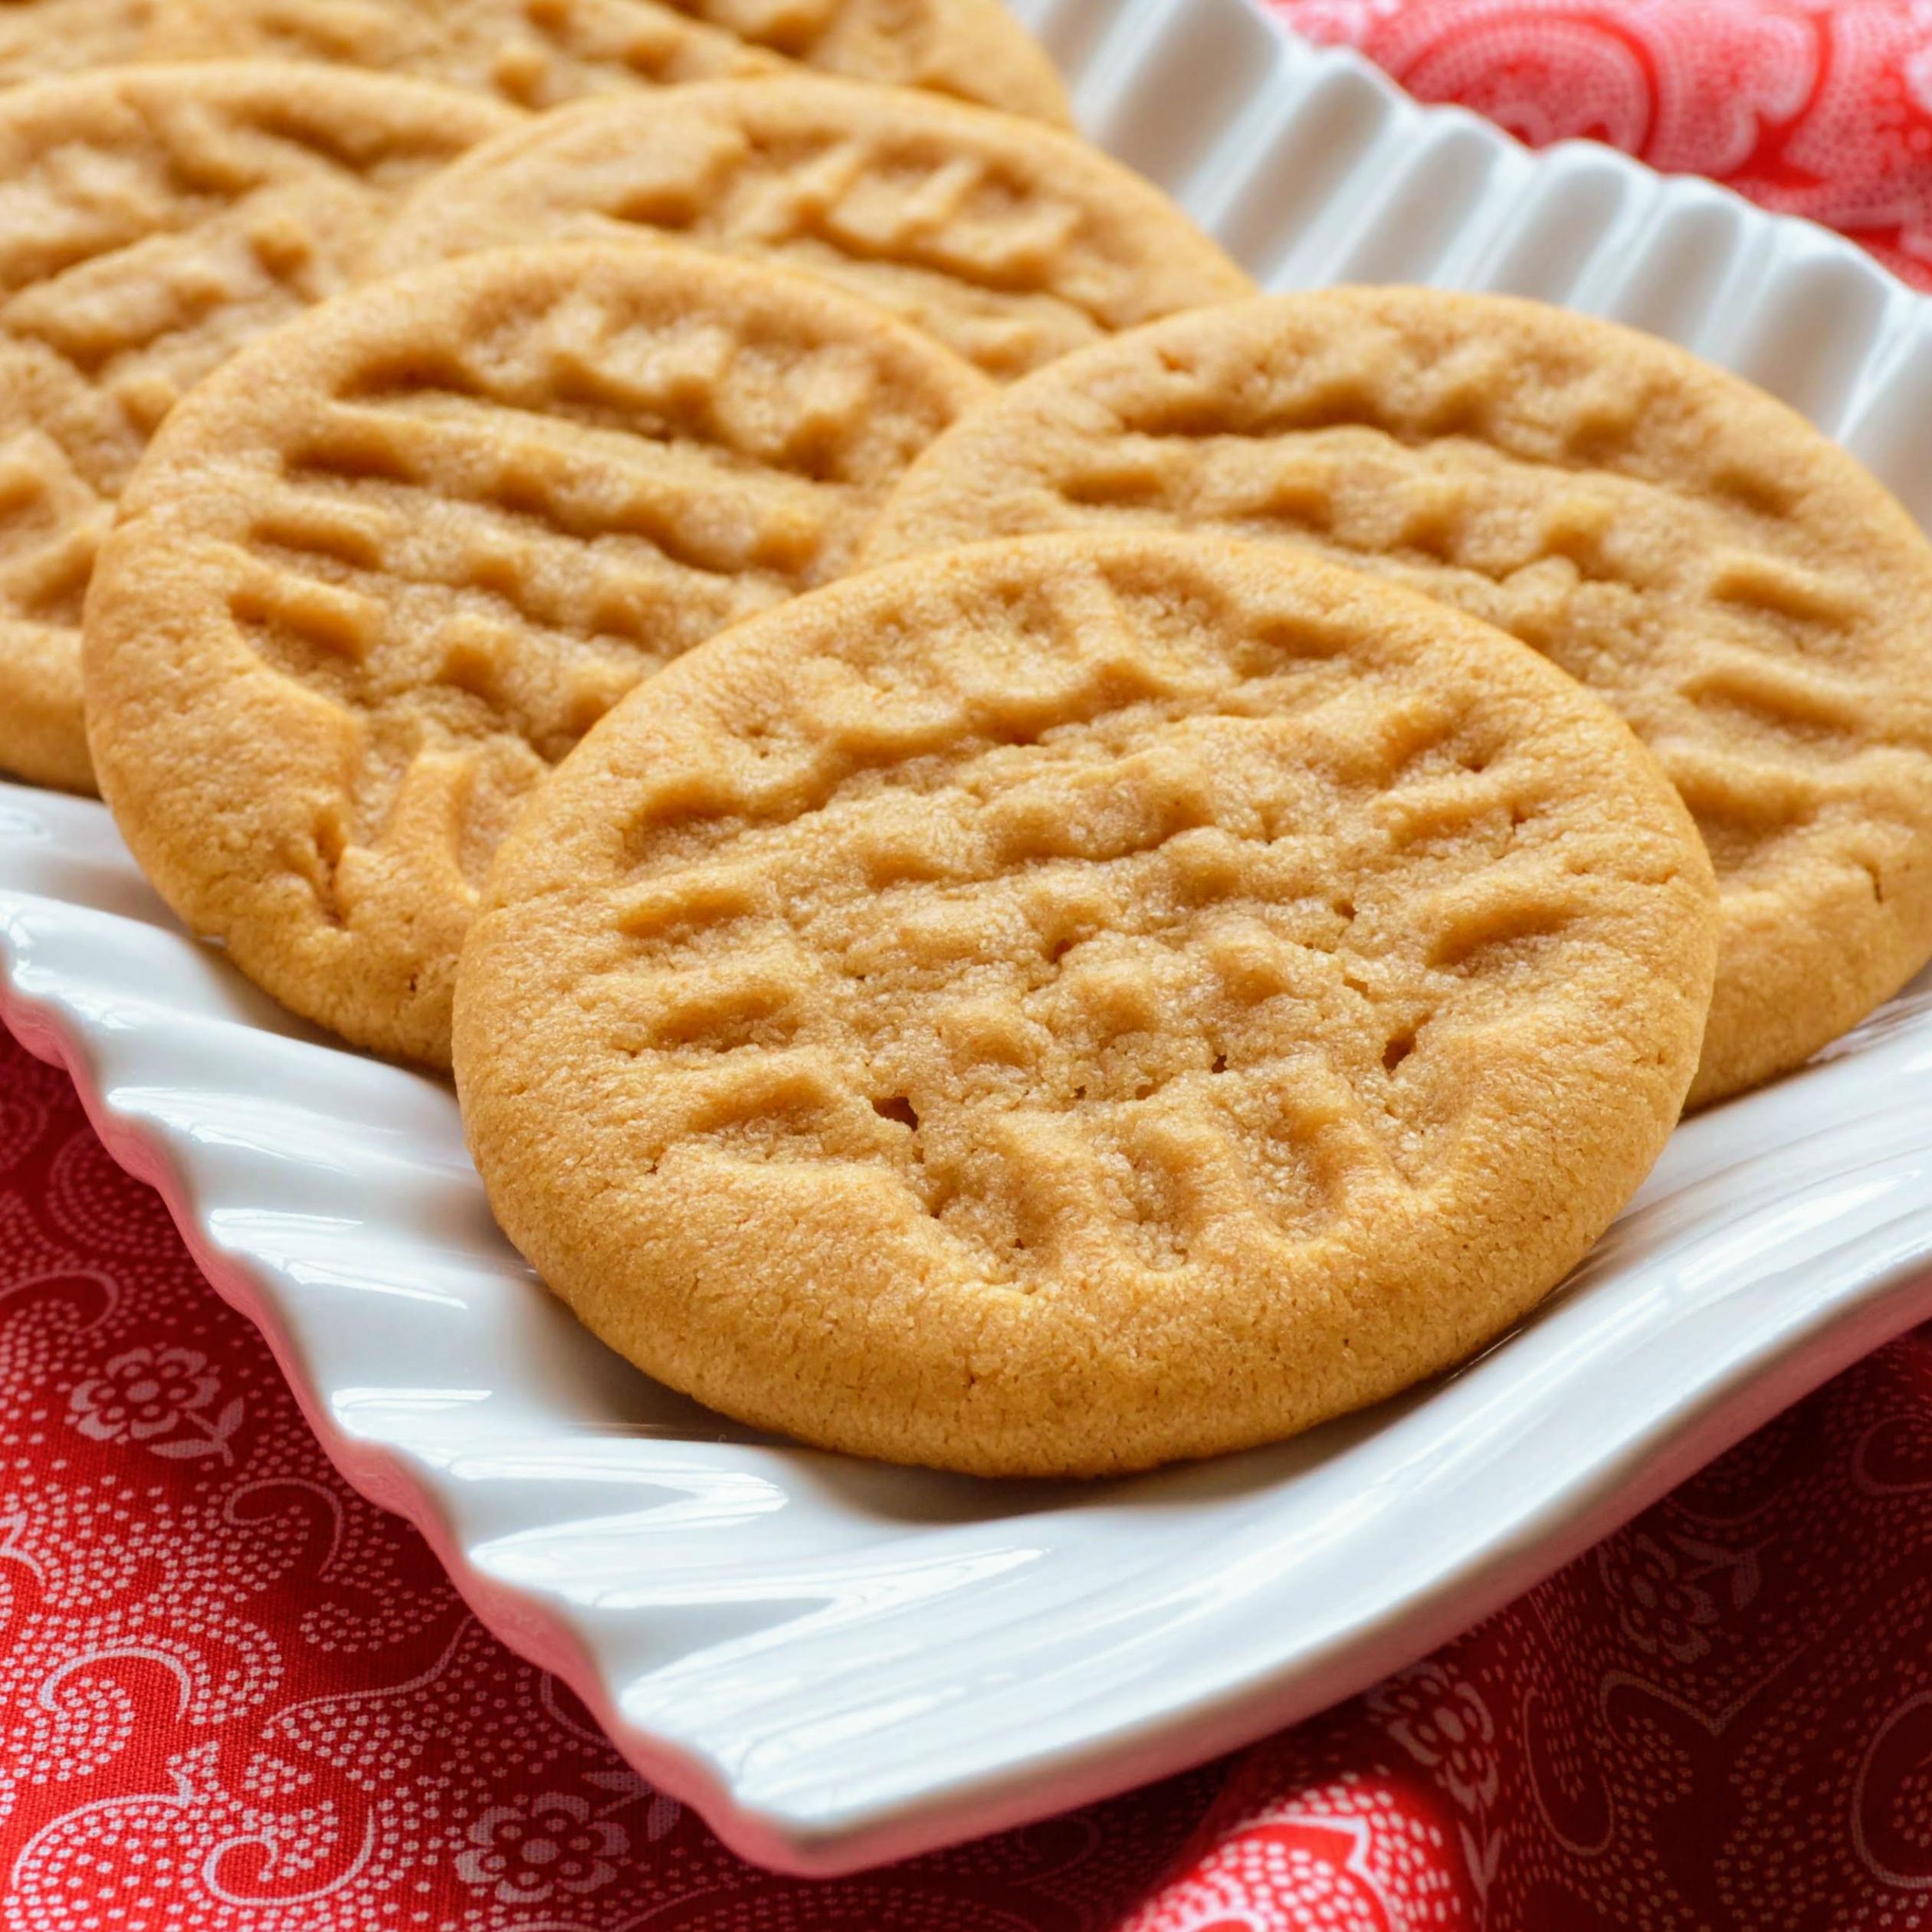 Chef John's Peanut Butter Cookies image